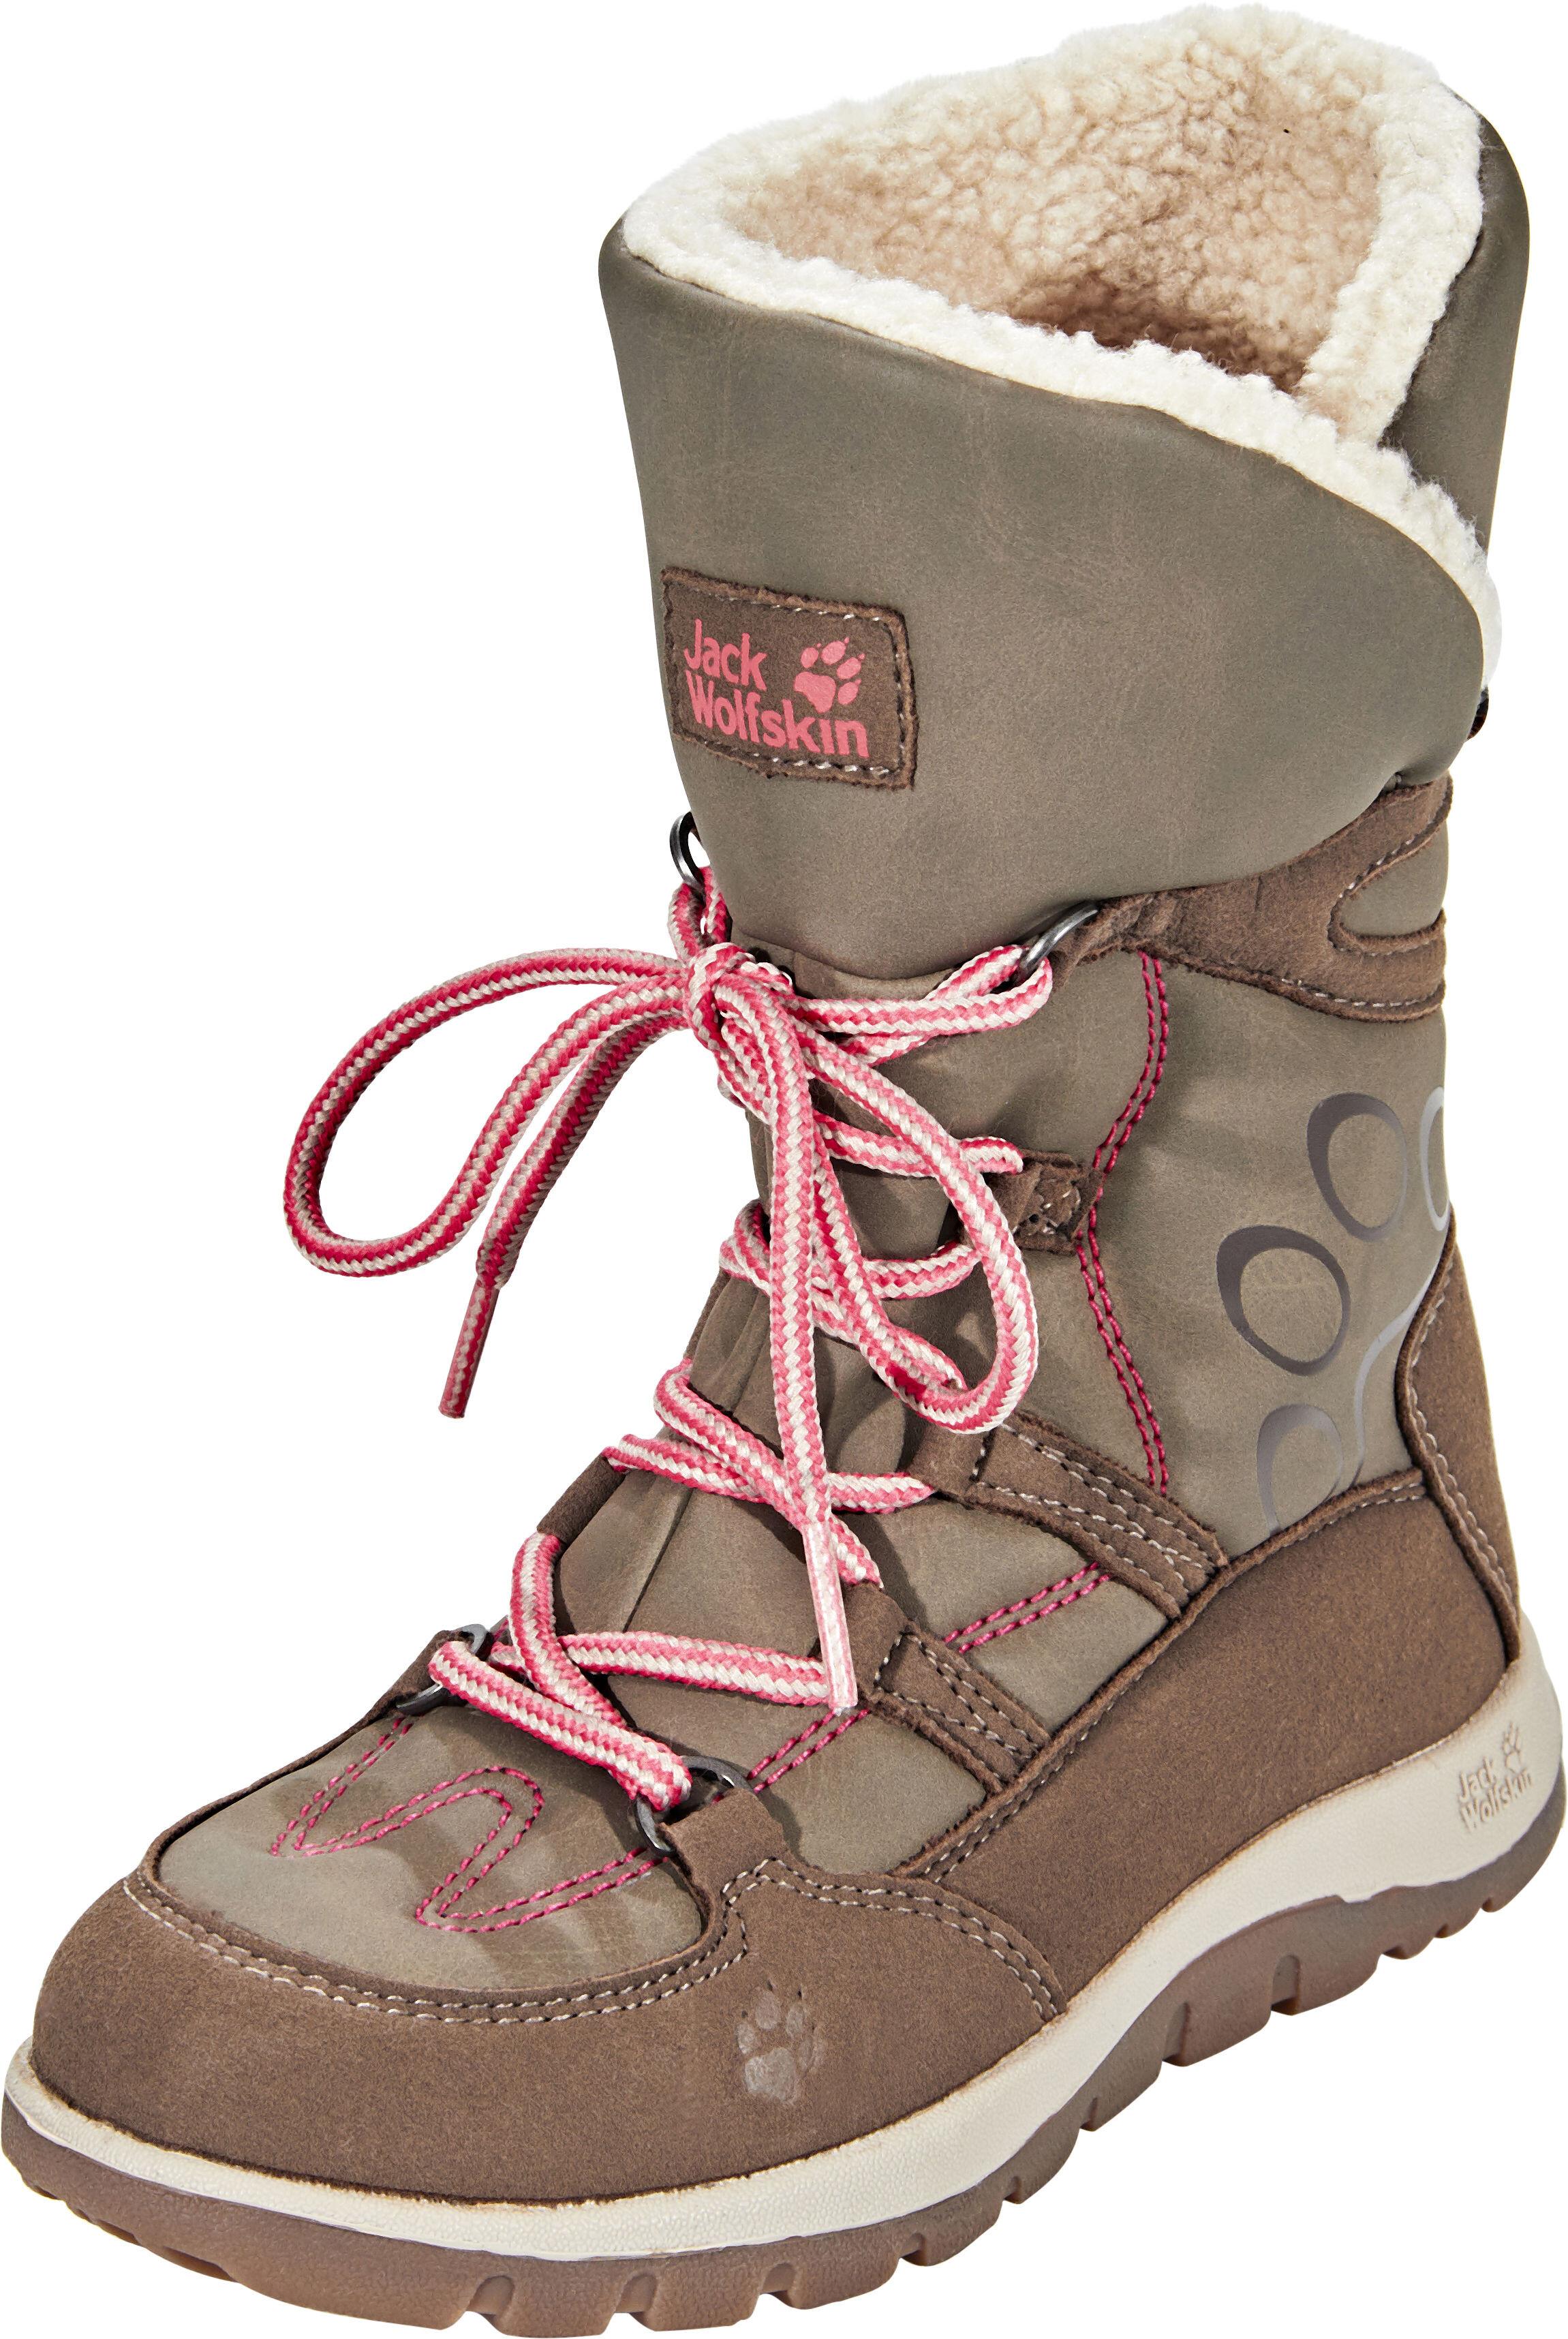 the latest 45302 a2c15 Jack Wolfskin Rhode Island Texapore High Winter Boots Girls siltstone